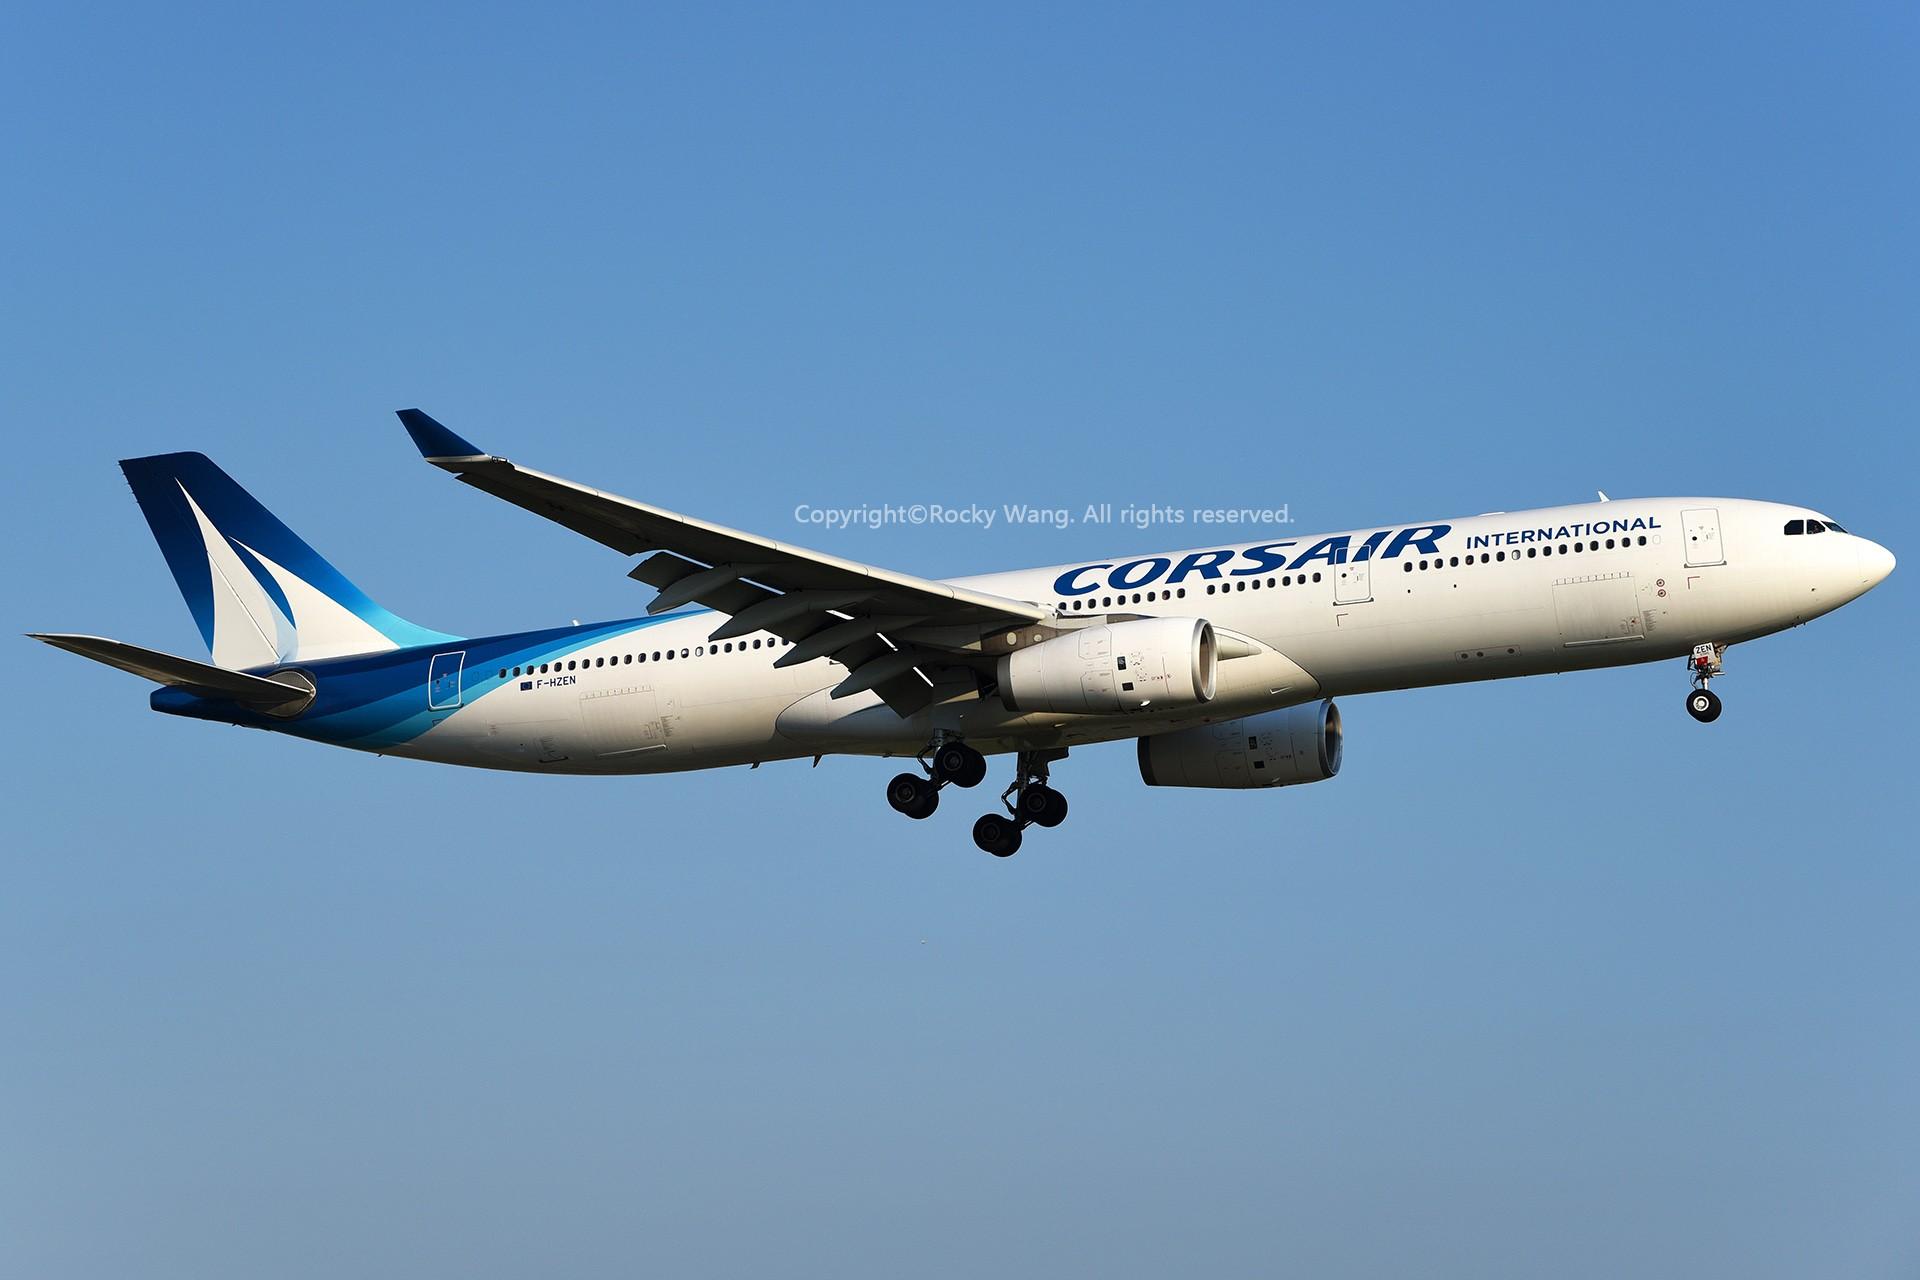 Re:[原创]A330s Around the World AIRBUS A330-343 F-HZEN 加拿大蒙特利尔特鲁多机场